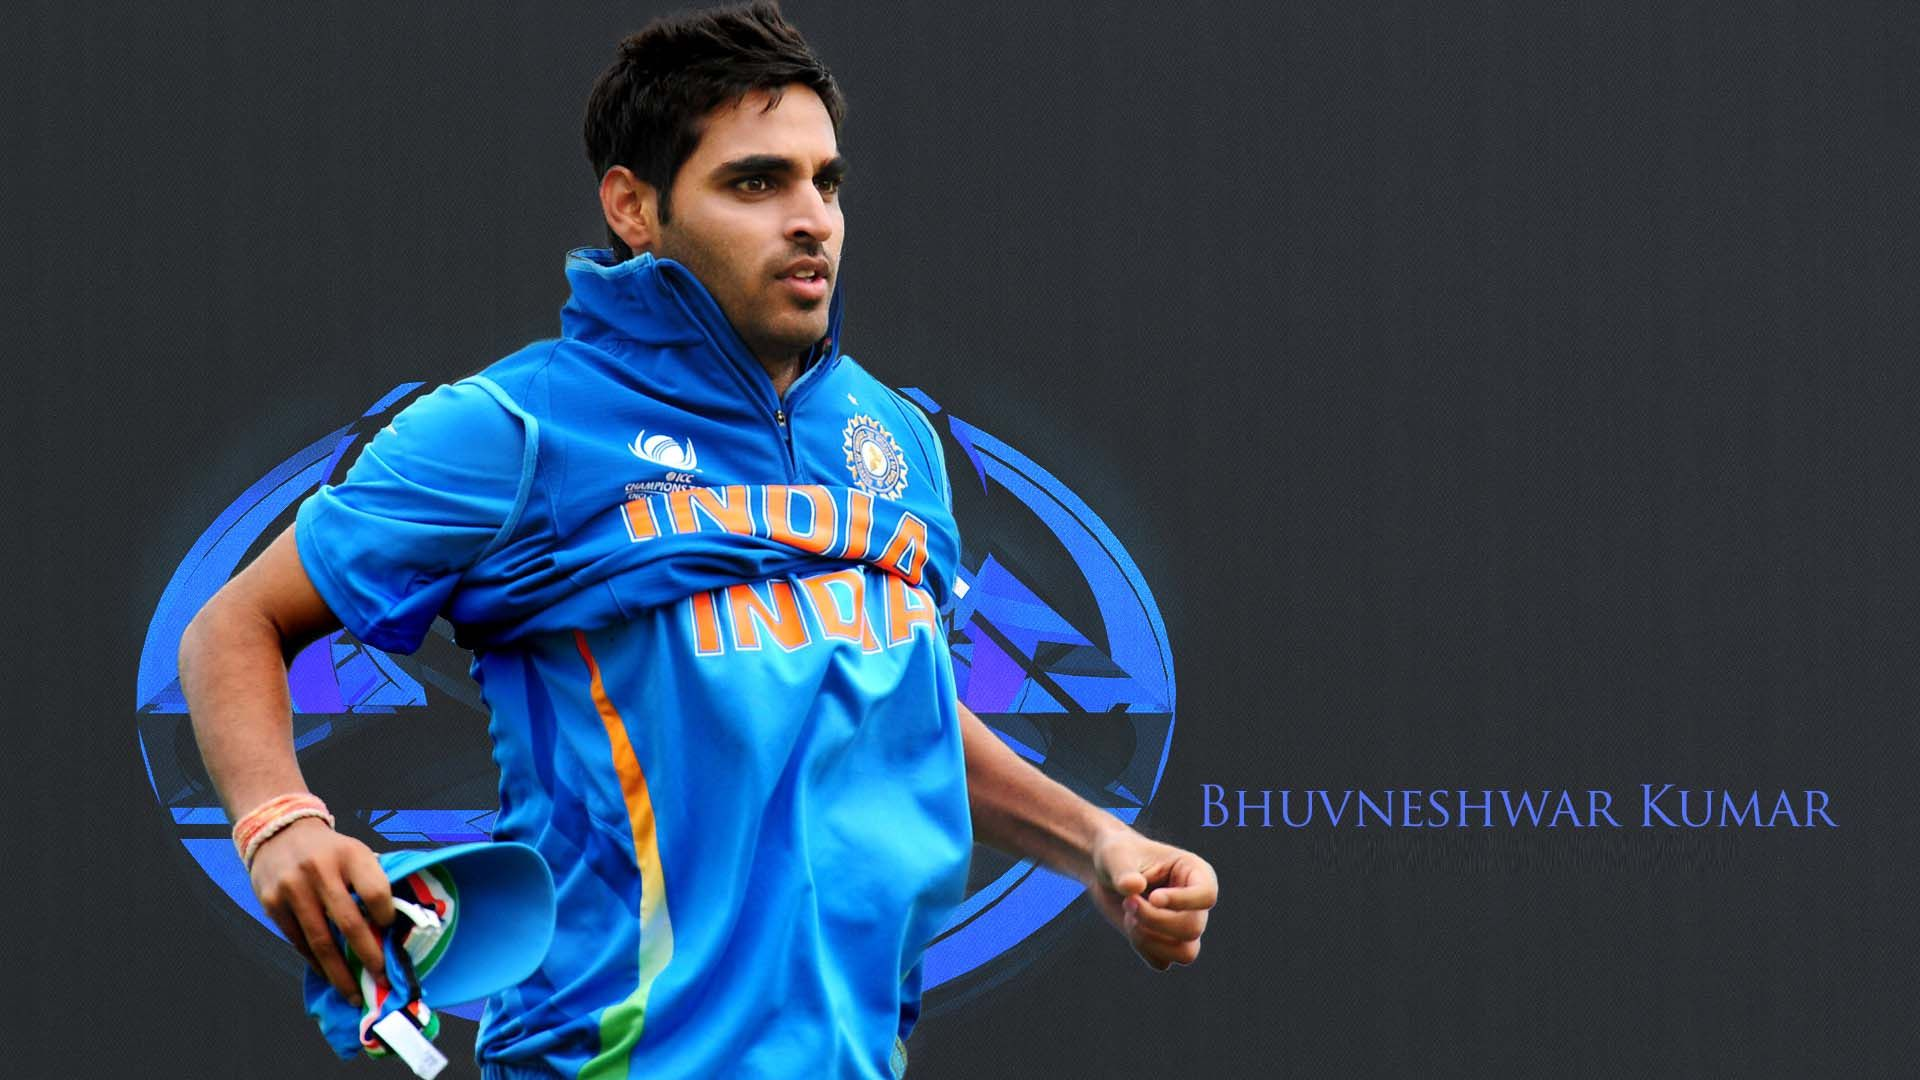 Hd wallpaper cricket - Bhuvneshwar Kumar Indian Cricketer Hd Wallpaper Indian Cricketer Wallpaper Cricket Bat Ball Ravindra Jadeja Virat Kohli Suresh Raina Mahe